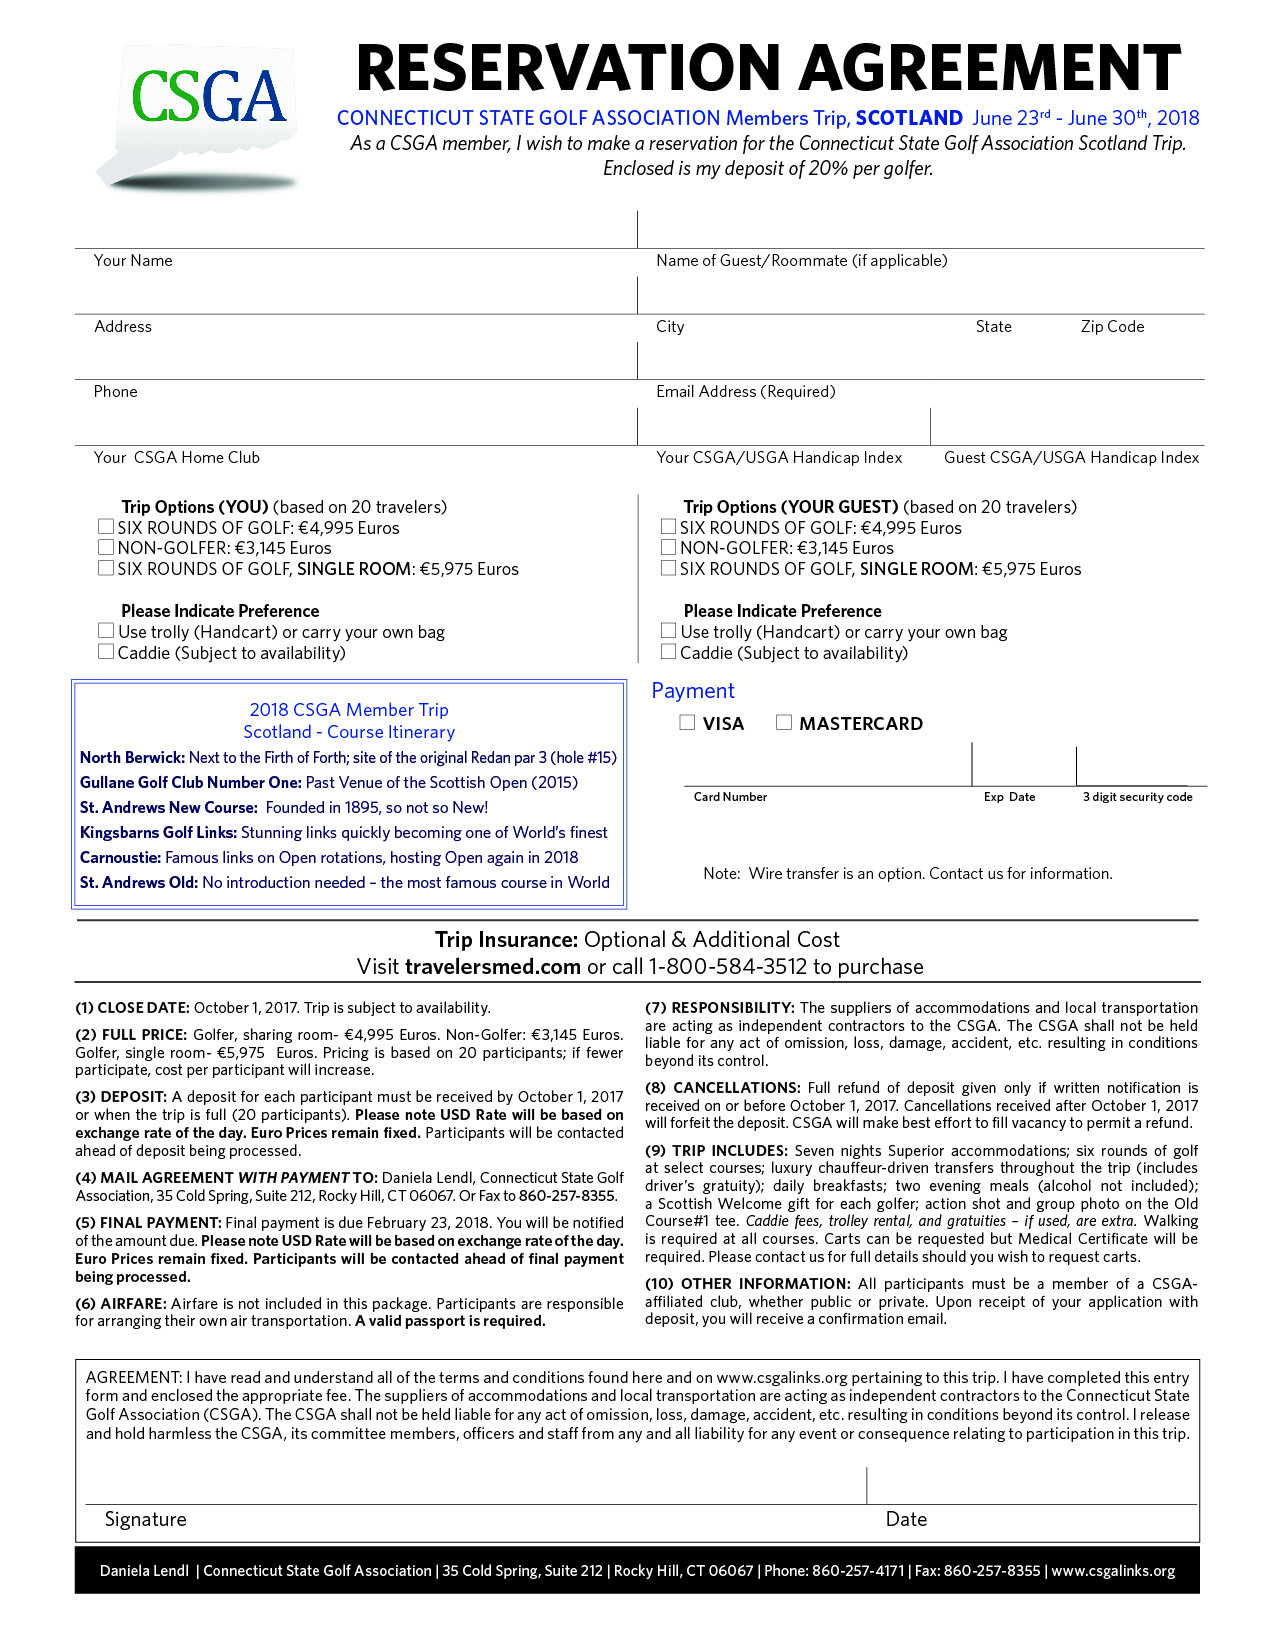 Connecticut Scotland 2018 Reservation Agreement